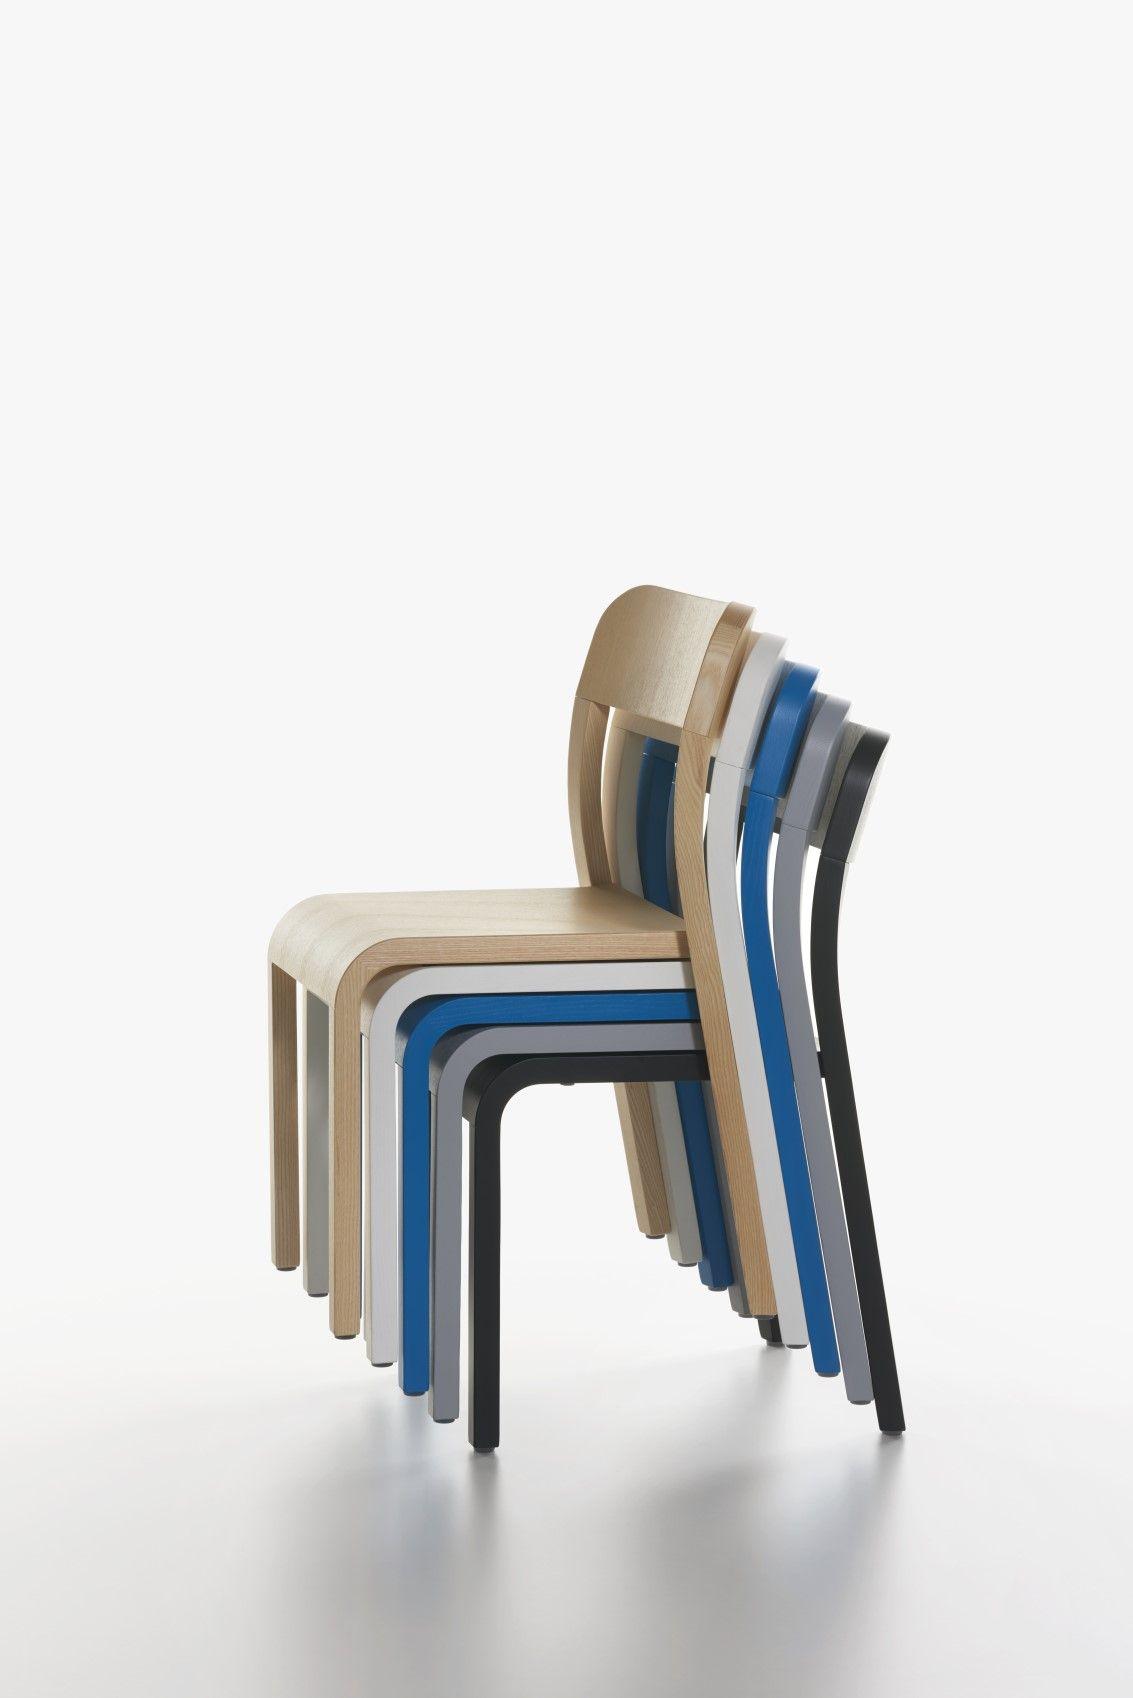 Plank Stuhl Blocco Designermobel Von Raum Form Plank Stuhle